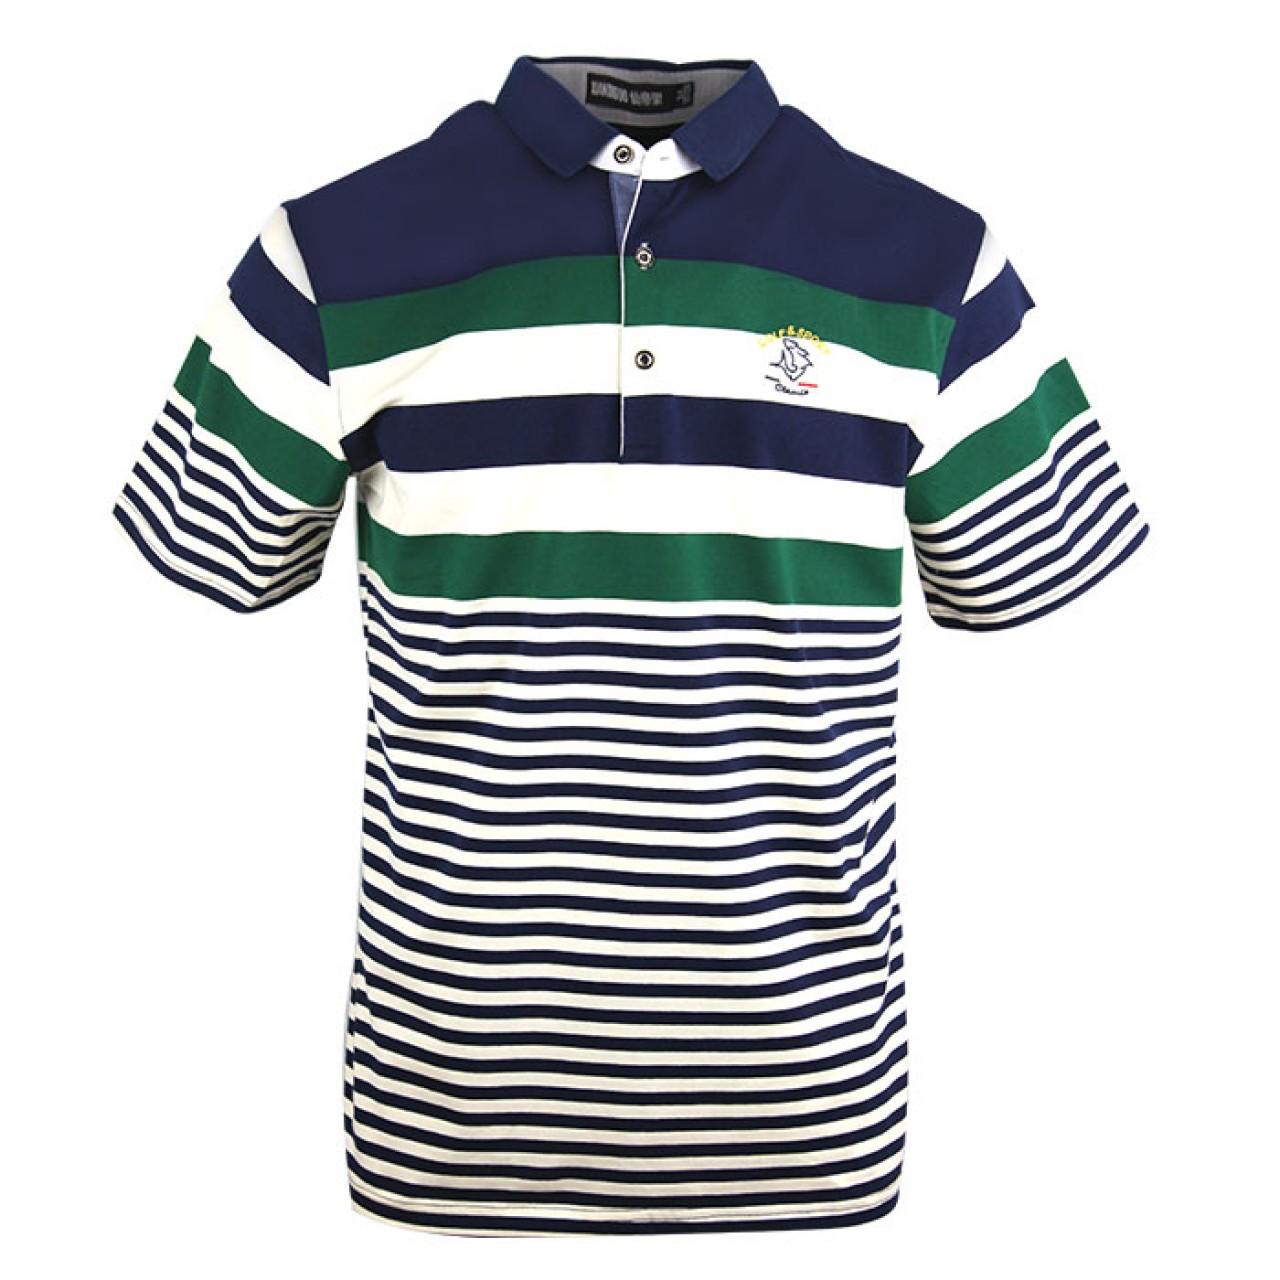 Men's Blue Collared Multicolor Stripe Tees